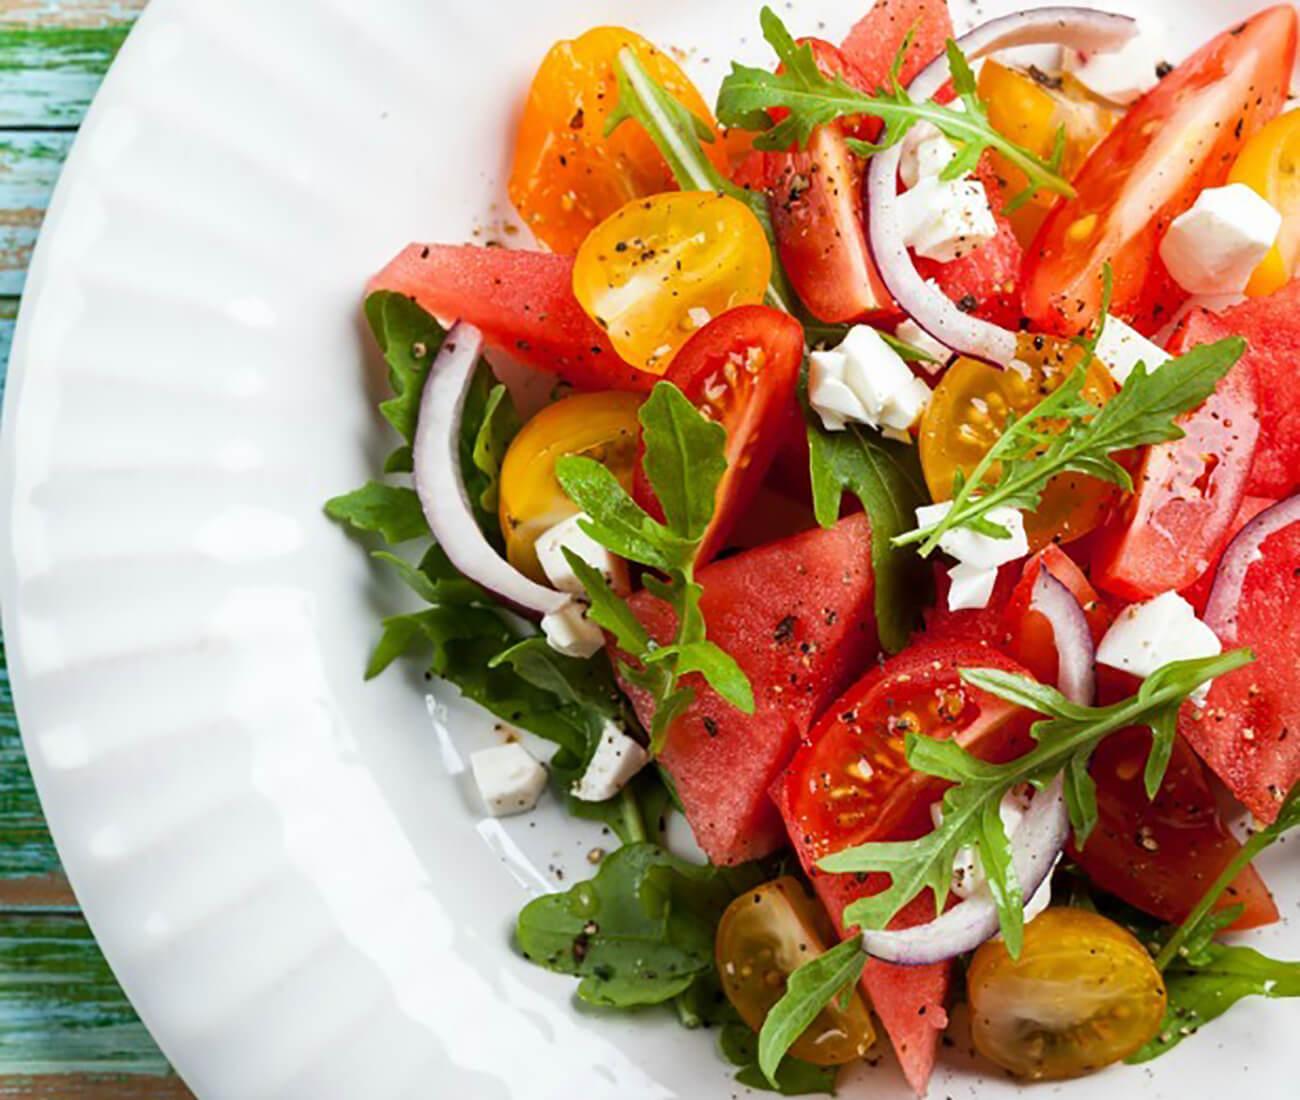 Image for Tomato & Watermelon Salad